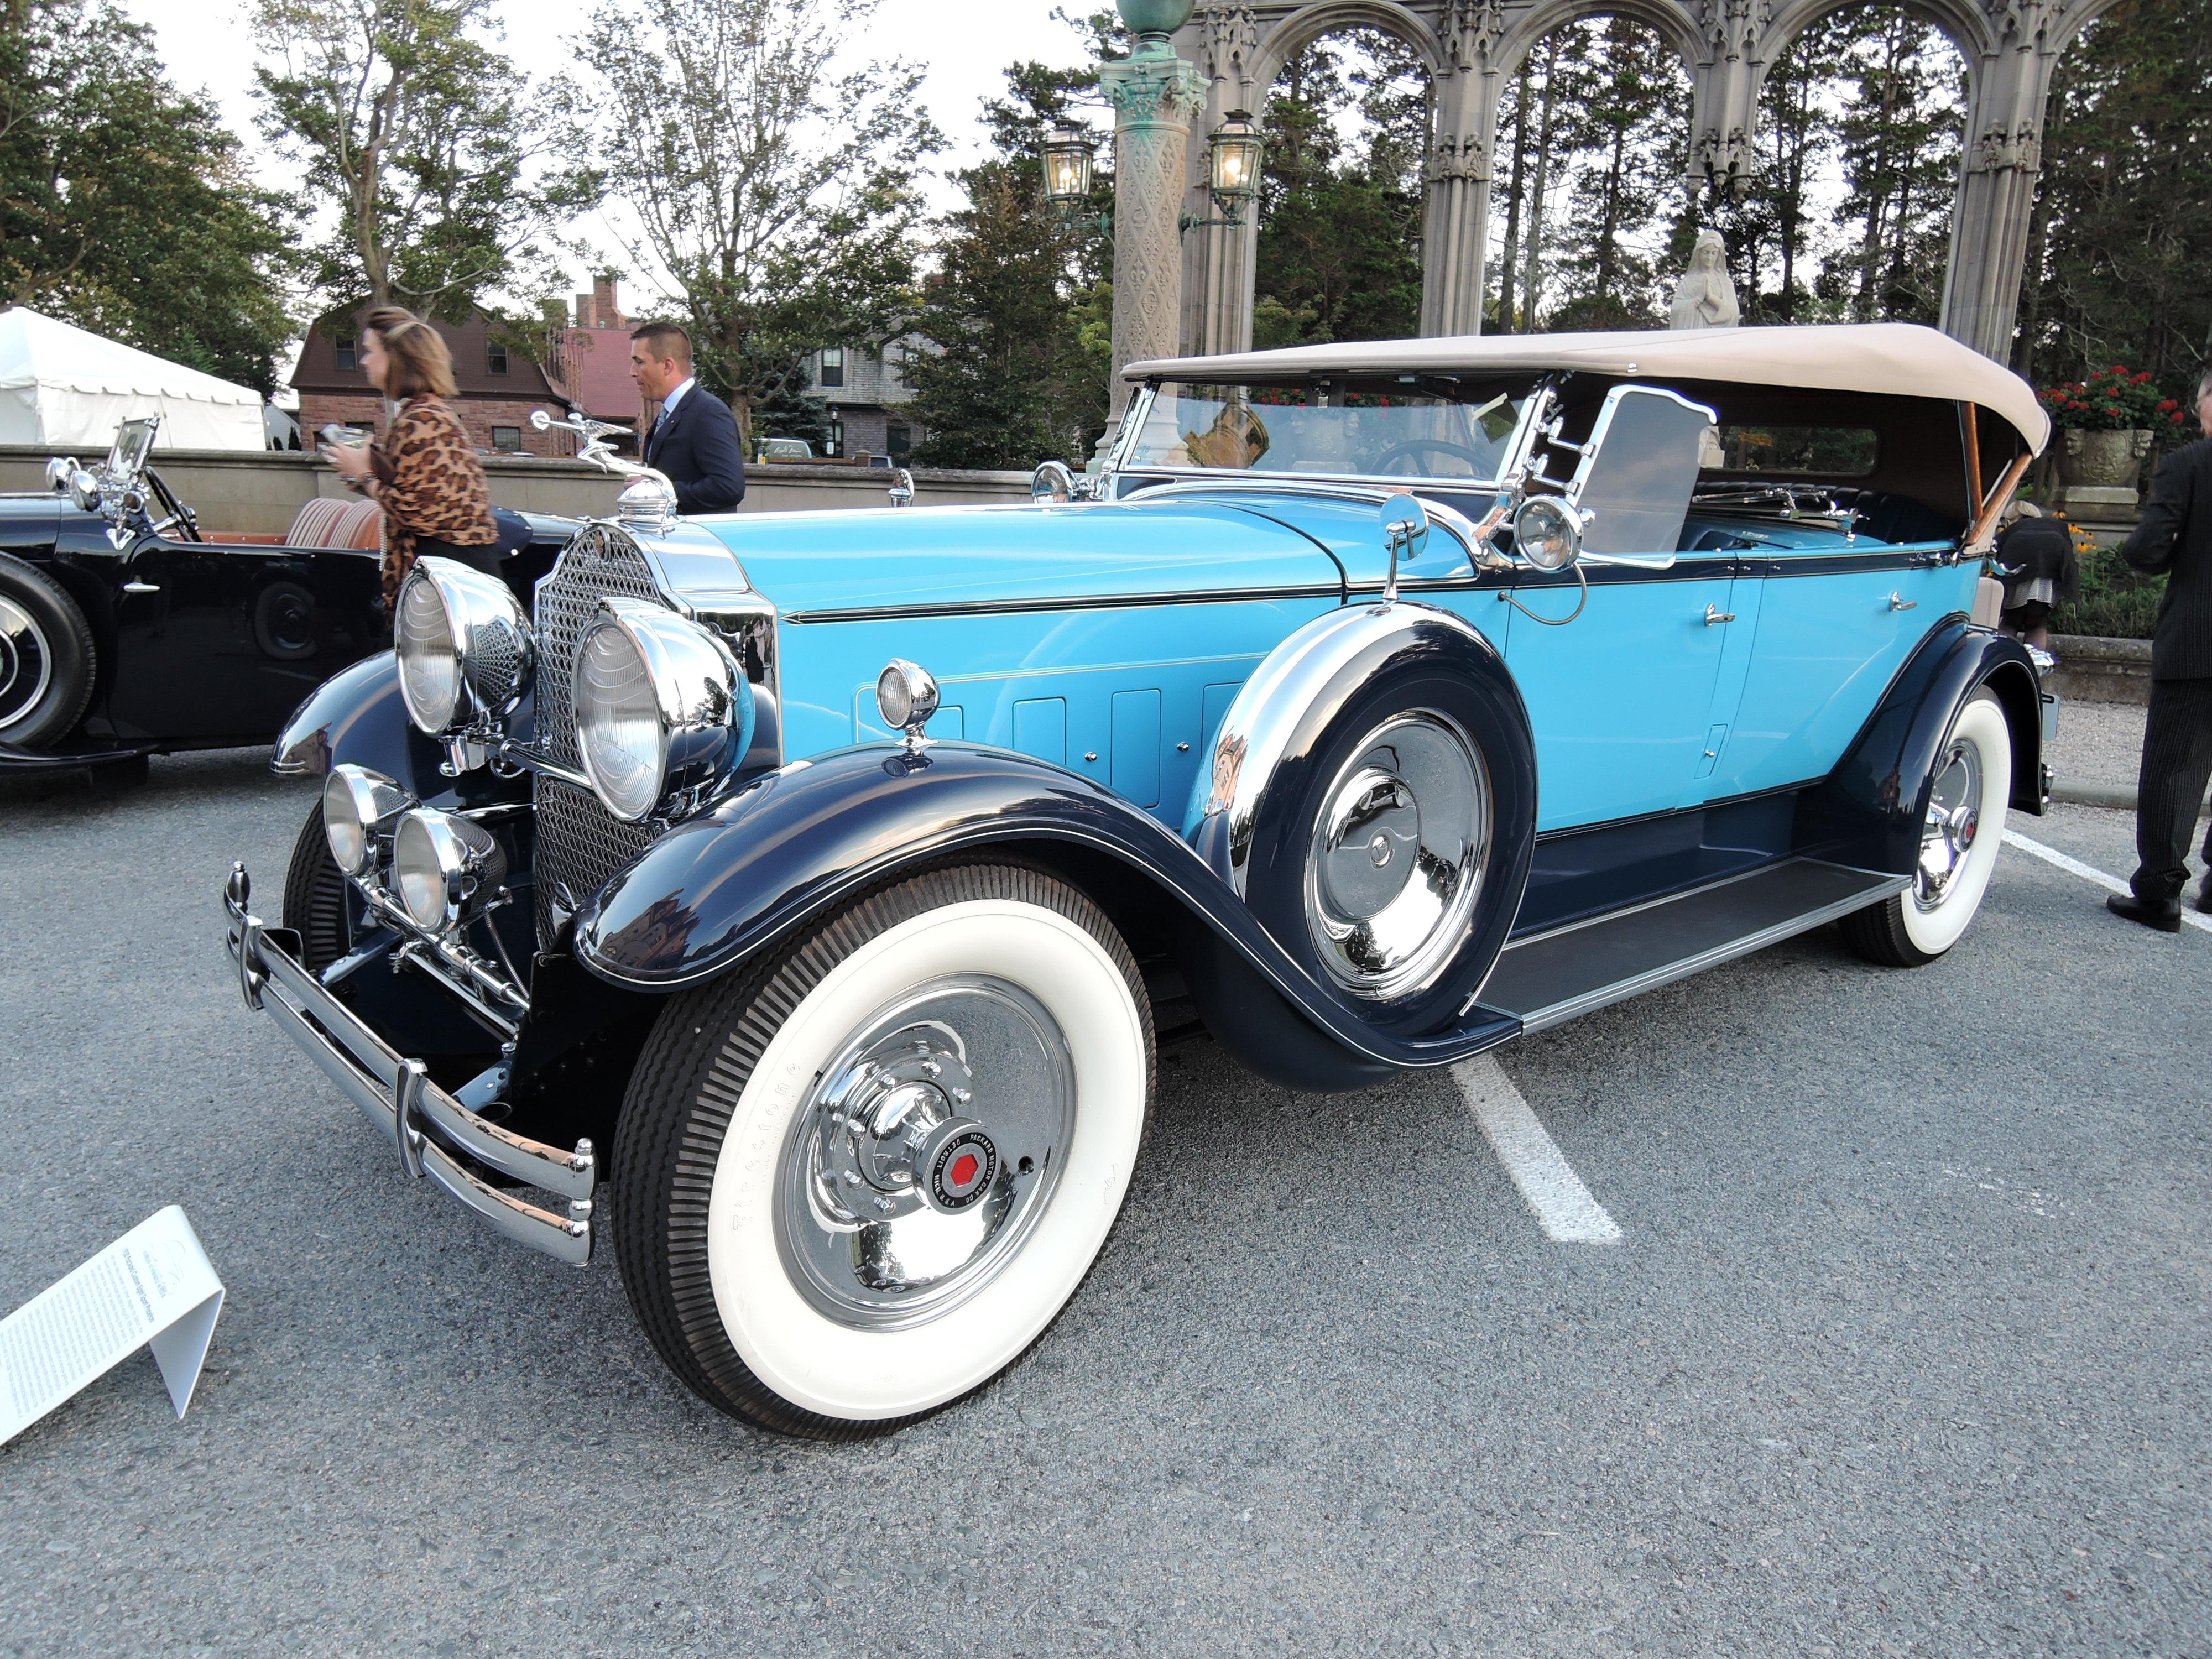 blue 1930 Packard Custom Eight Sport Phaeton - Audrain Auto Museum Gala 2017